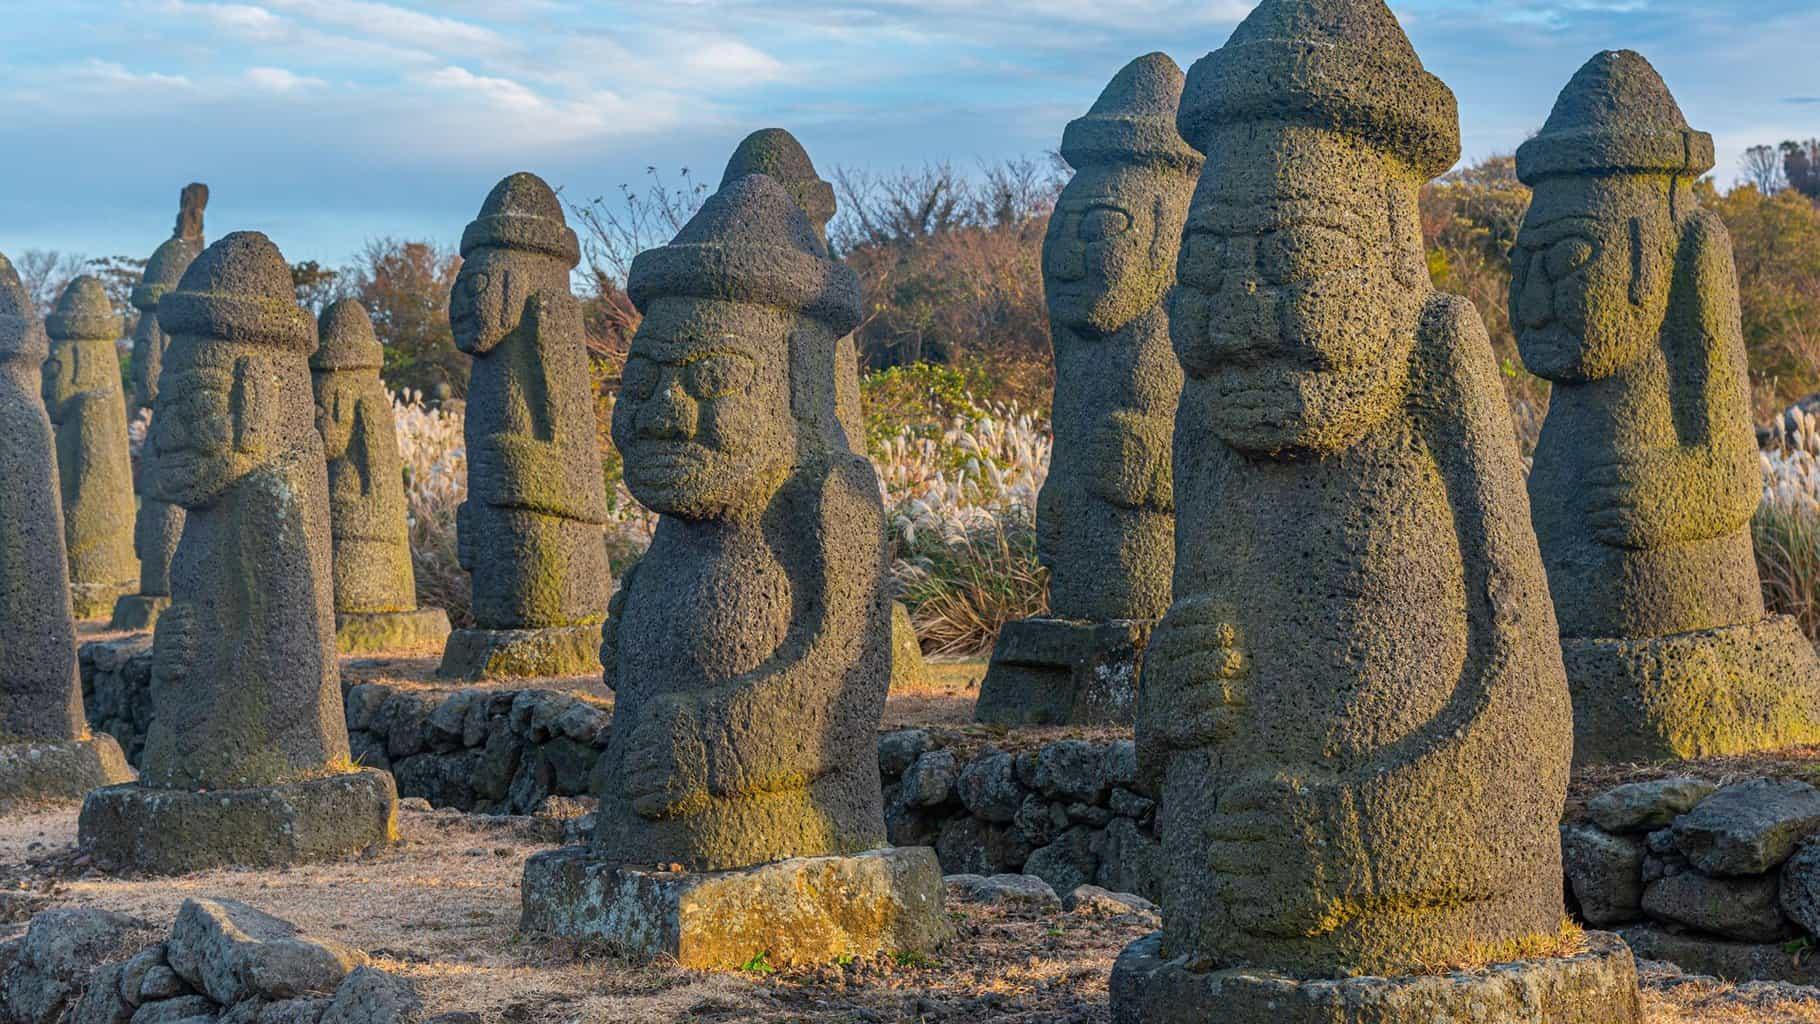 Dol hareubang statues at Jeju stone park in South Korea.